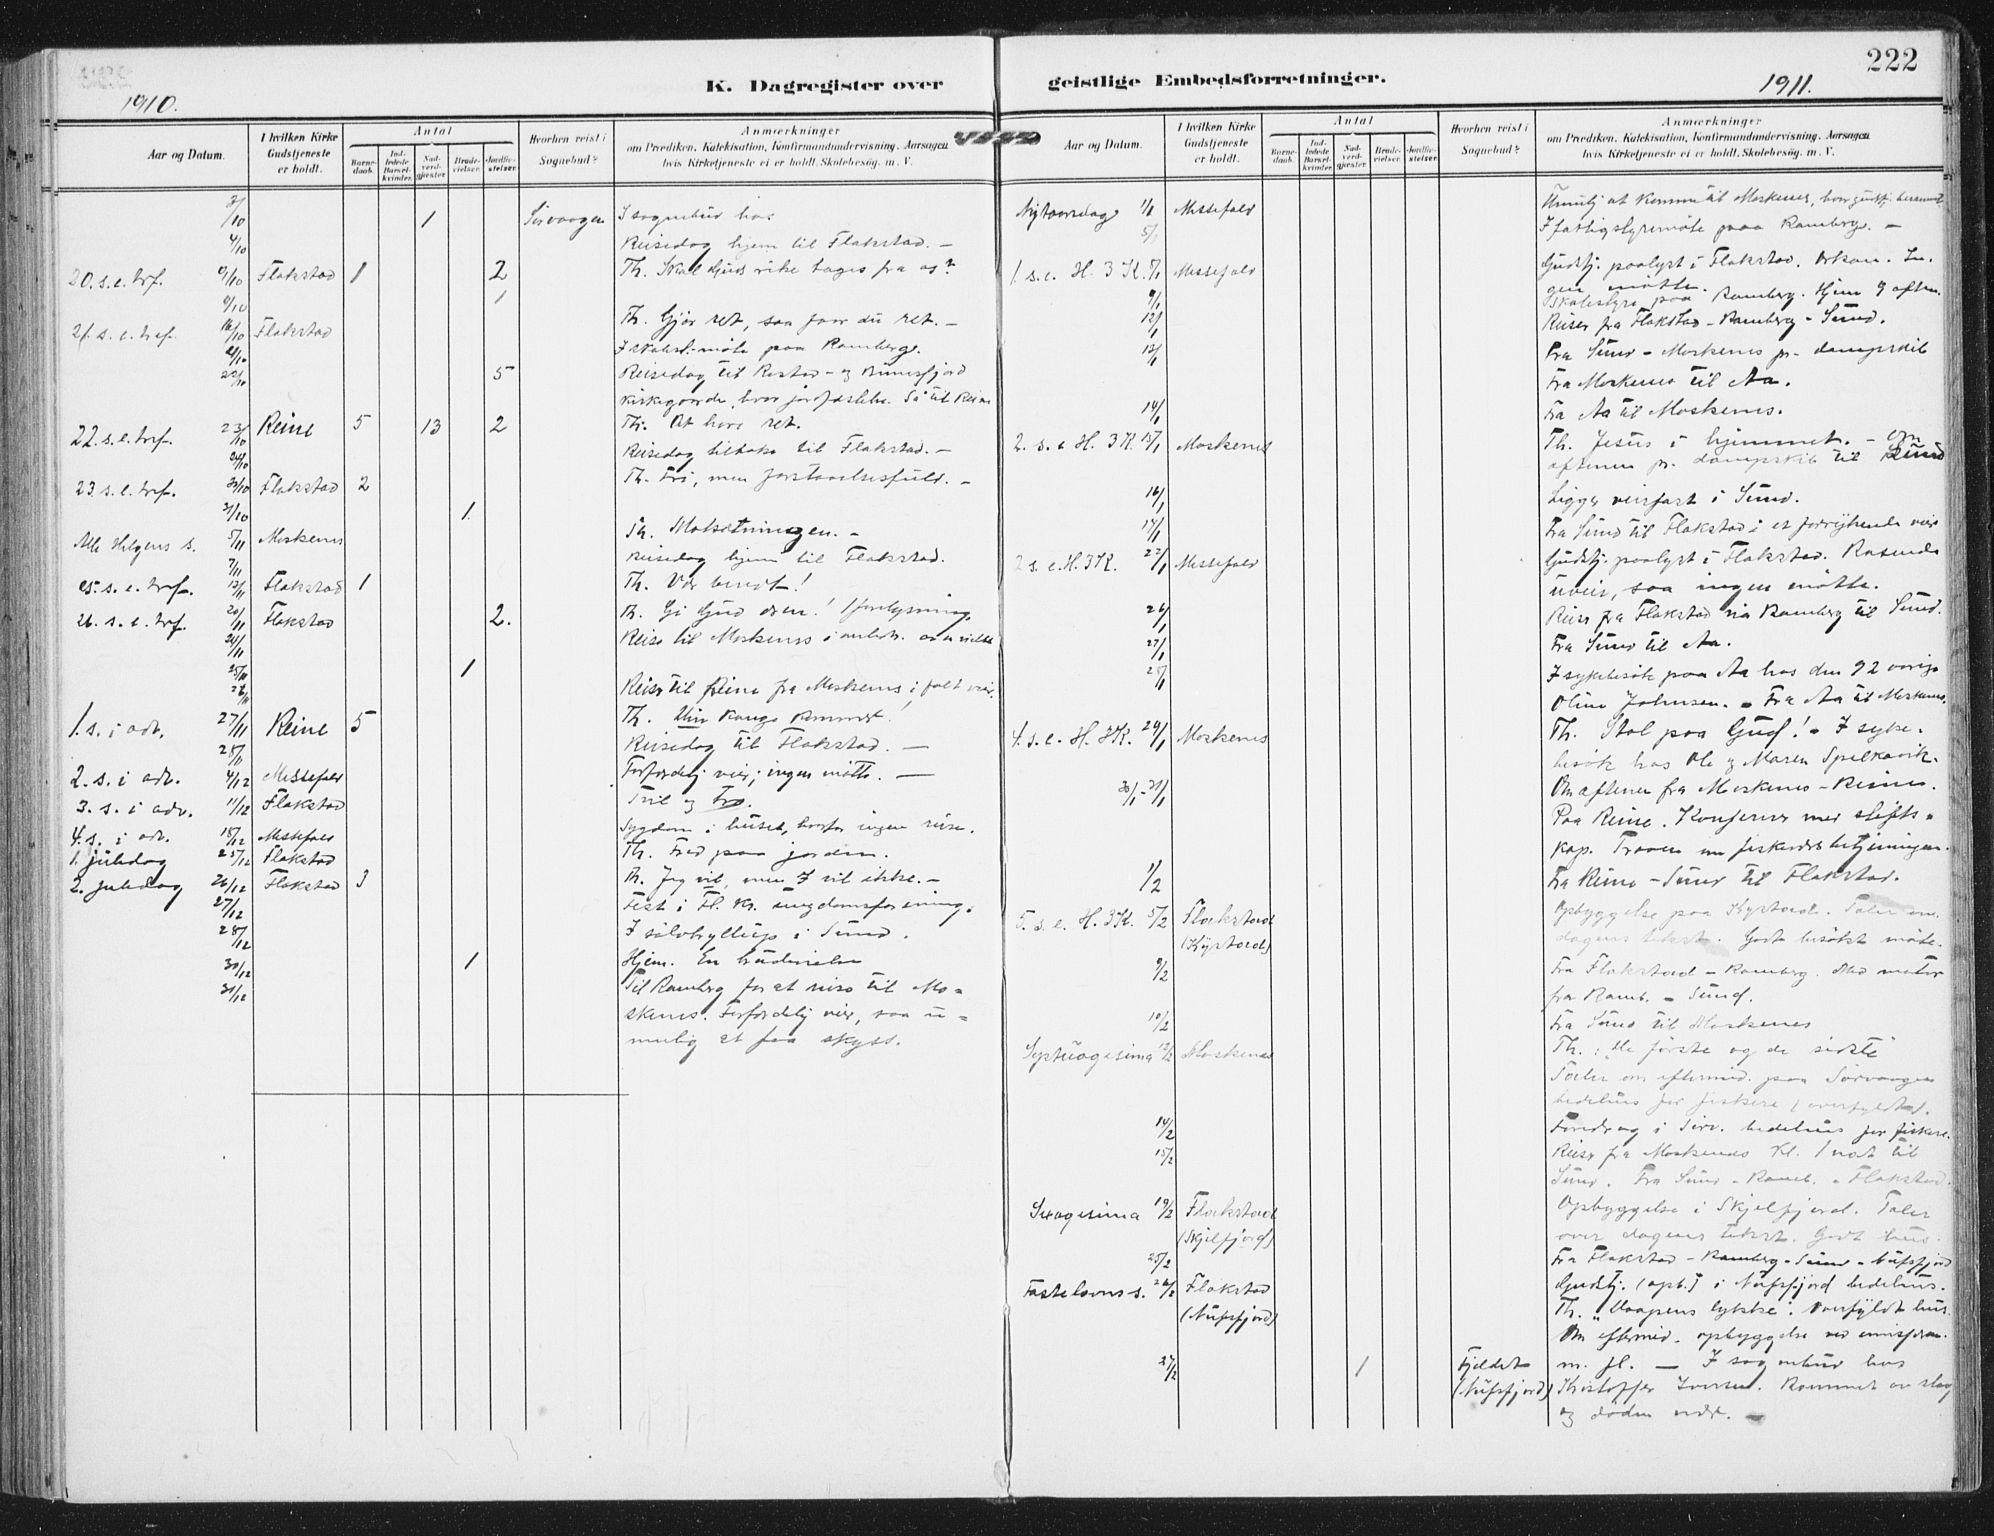 SAT, Ministerialprotokoller, klokkerbøker og fødselsregistre - Nordland, 885/L1206: Ministerialbok nr. 885A07, 1905-1915, s. 222